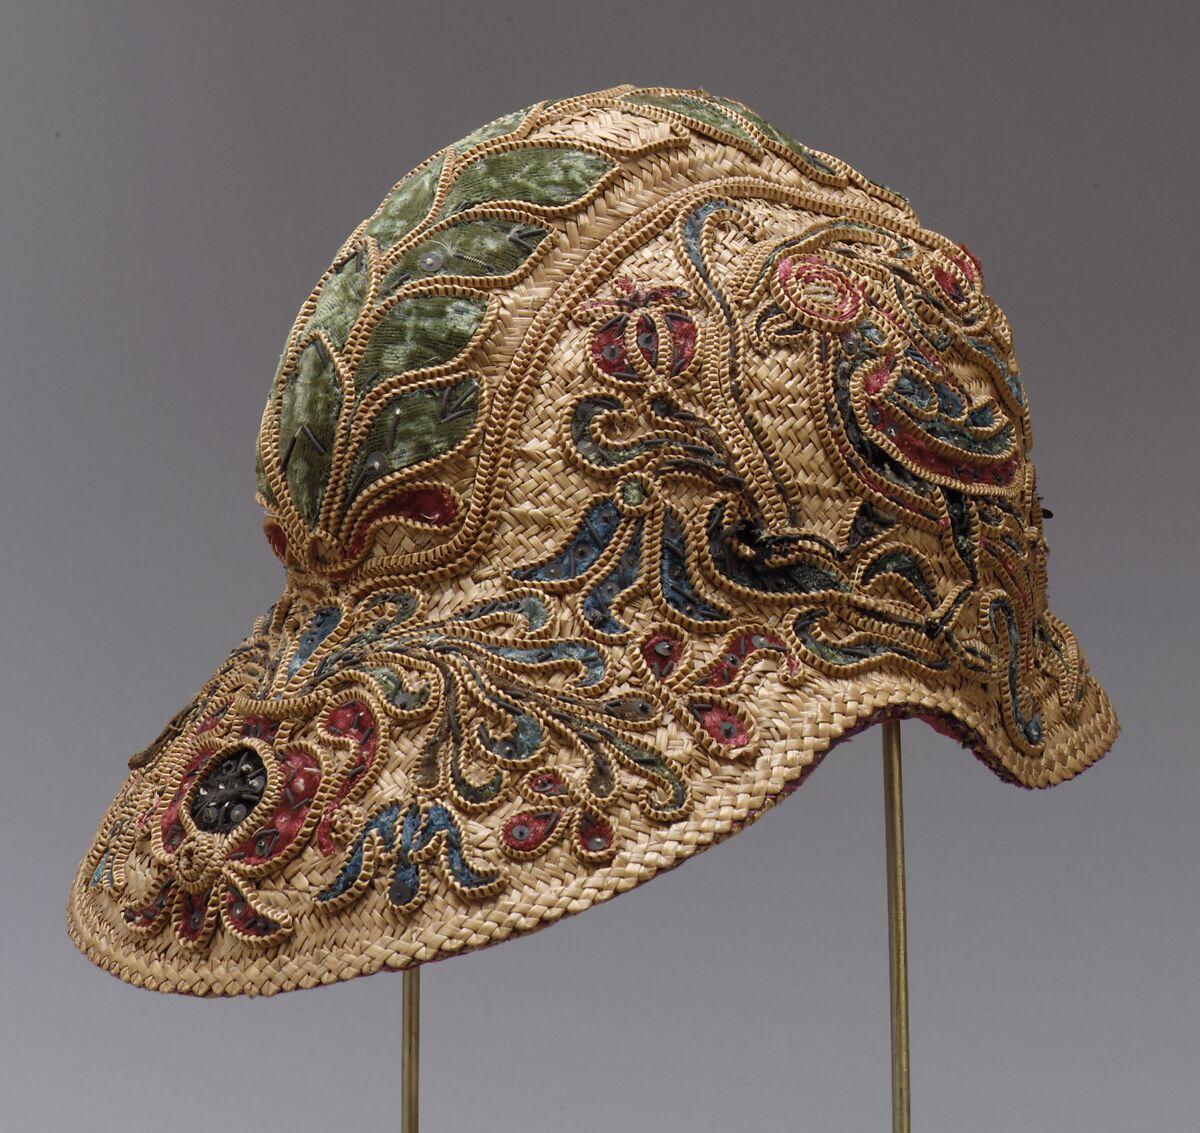 Helmet | Spanish | The Met